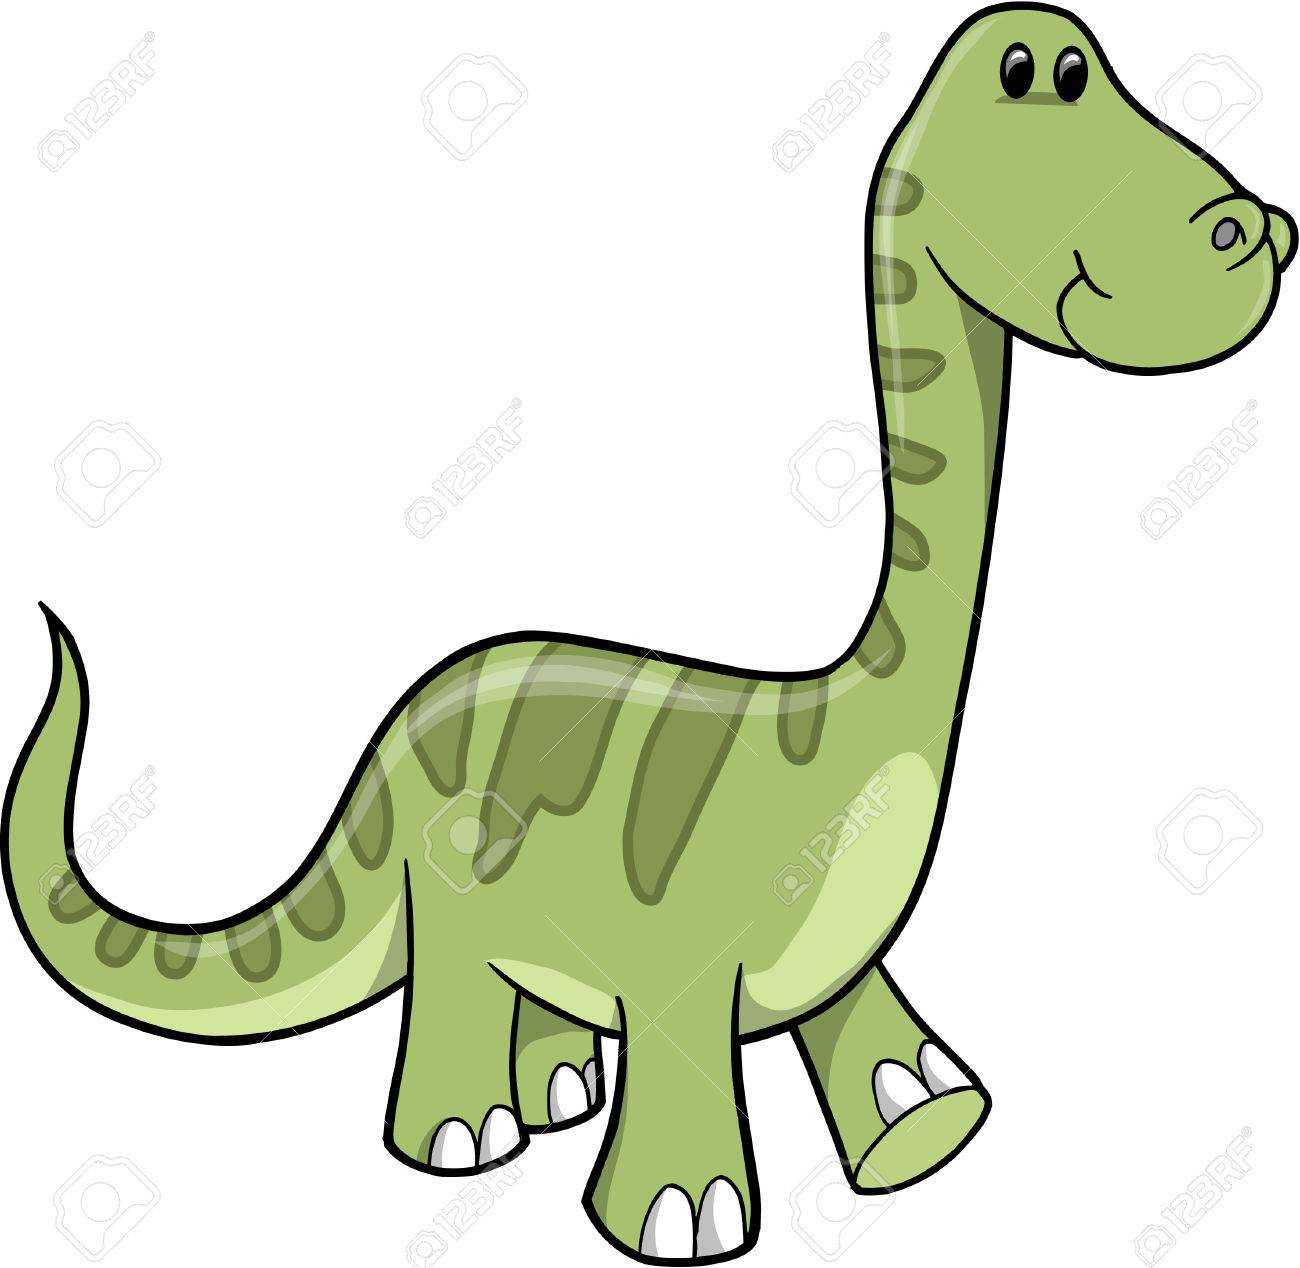 Cute Dinosaur - 7025957